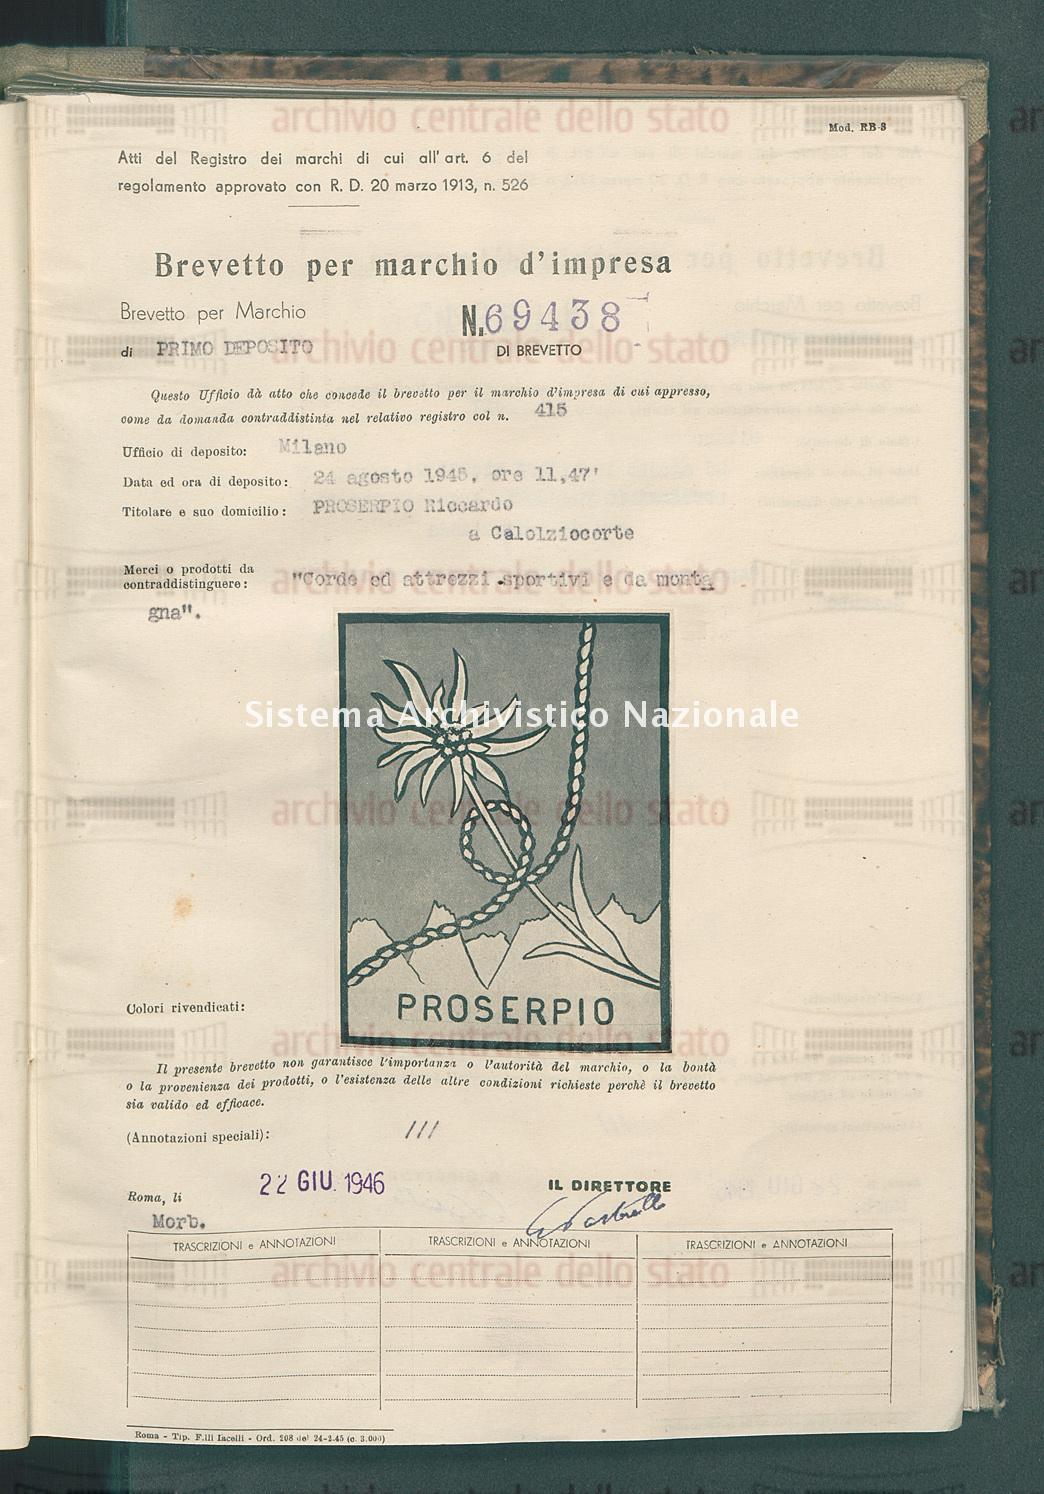 'Corde ed attrezzi sportivi e da montagna' Prosepio Riccardo (22/06/1946)